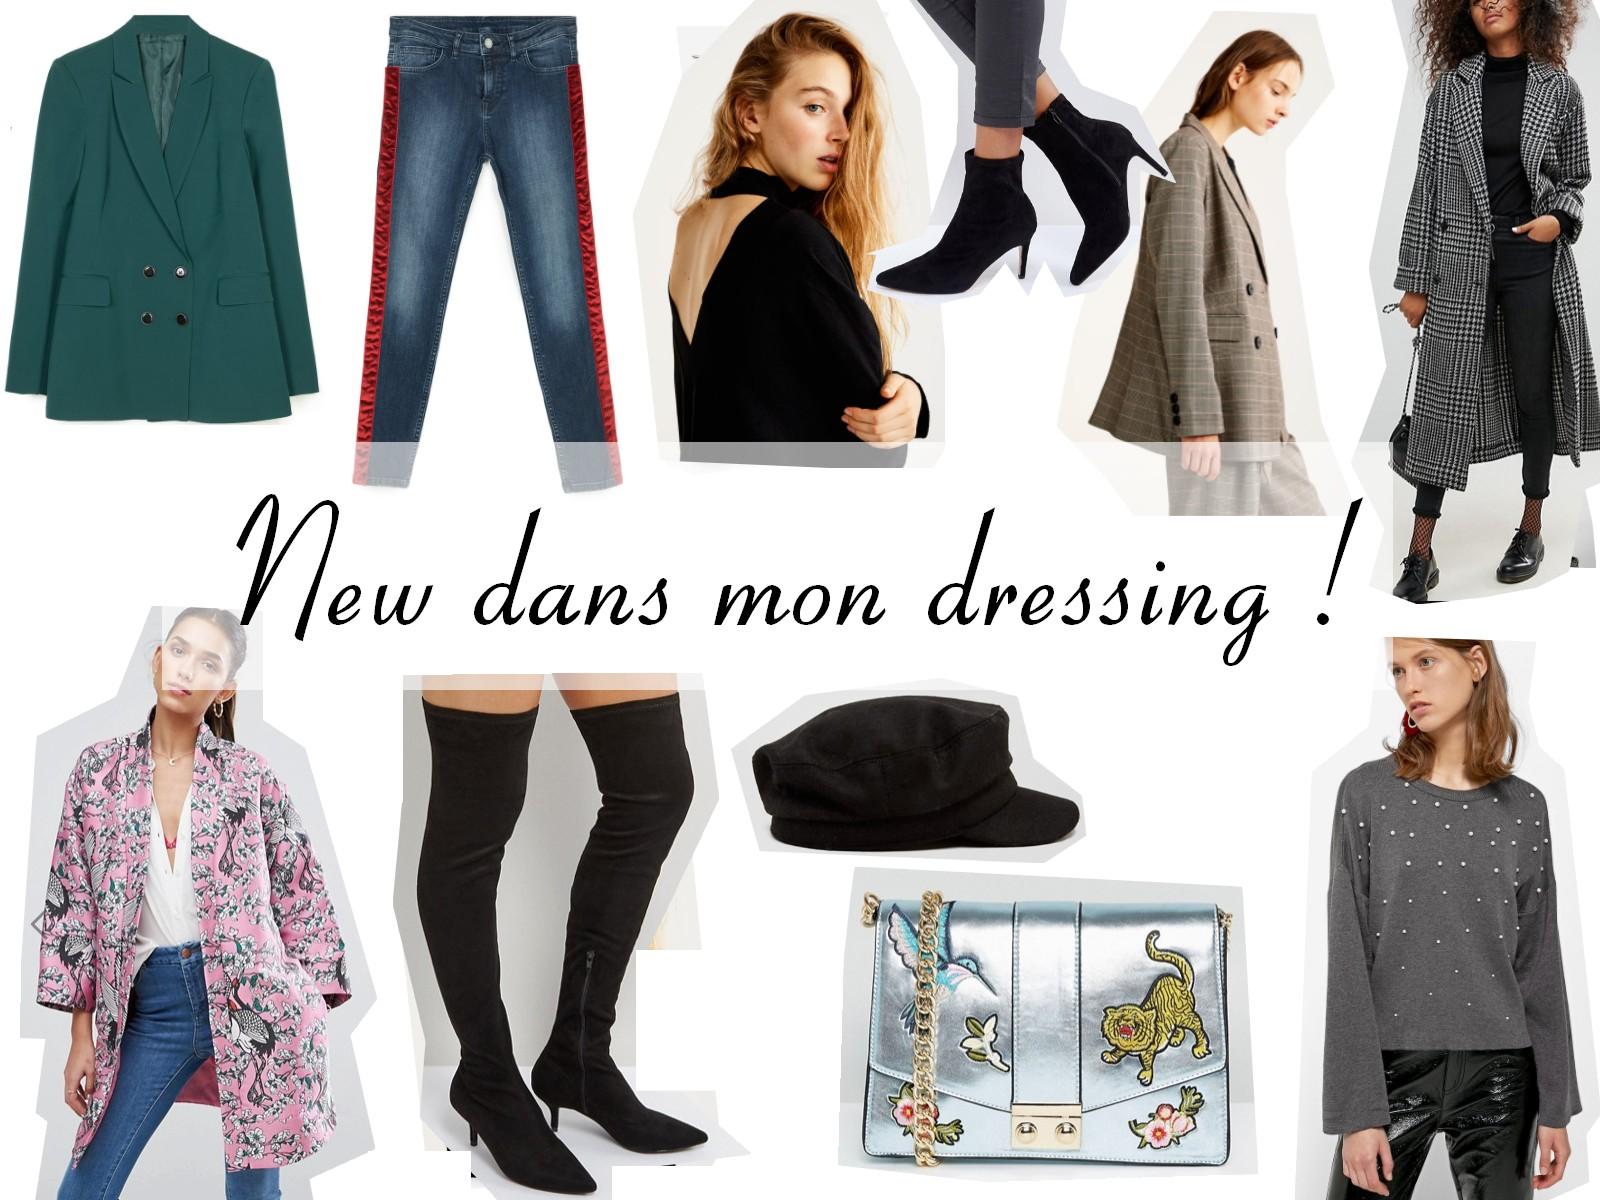 ca6c56329fa41b Mes dernières commandes - Styles by Assitan. Blog mode. French style ...